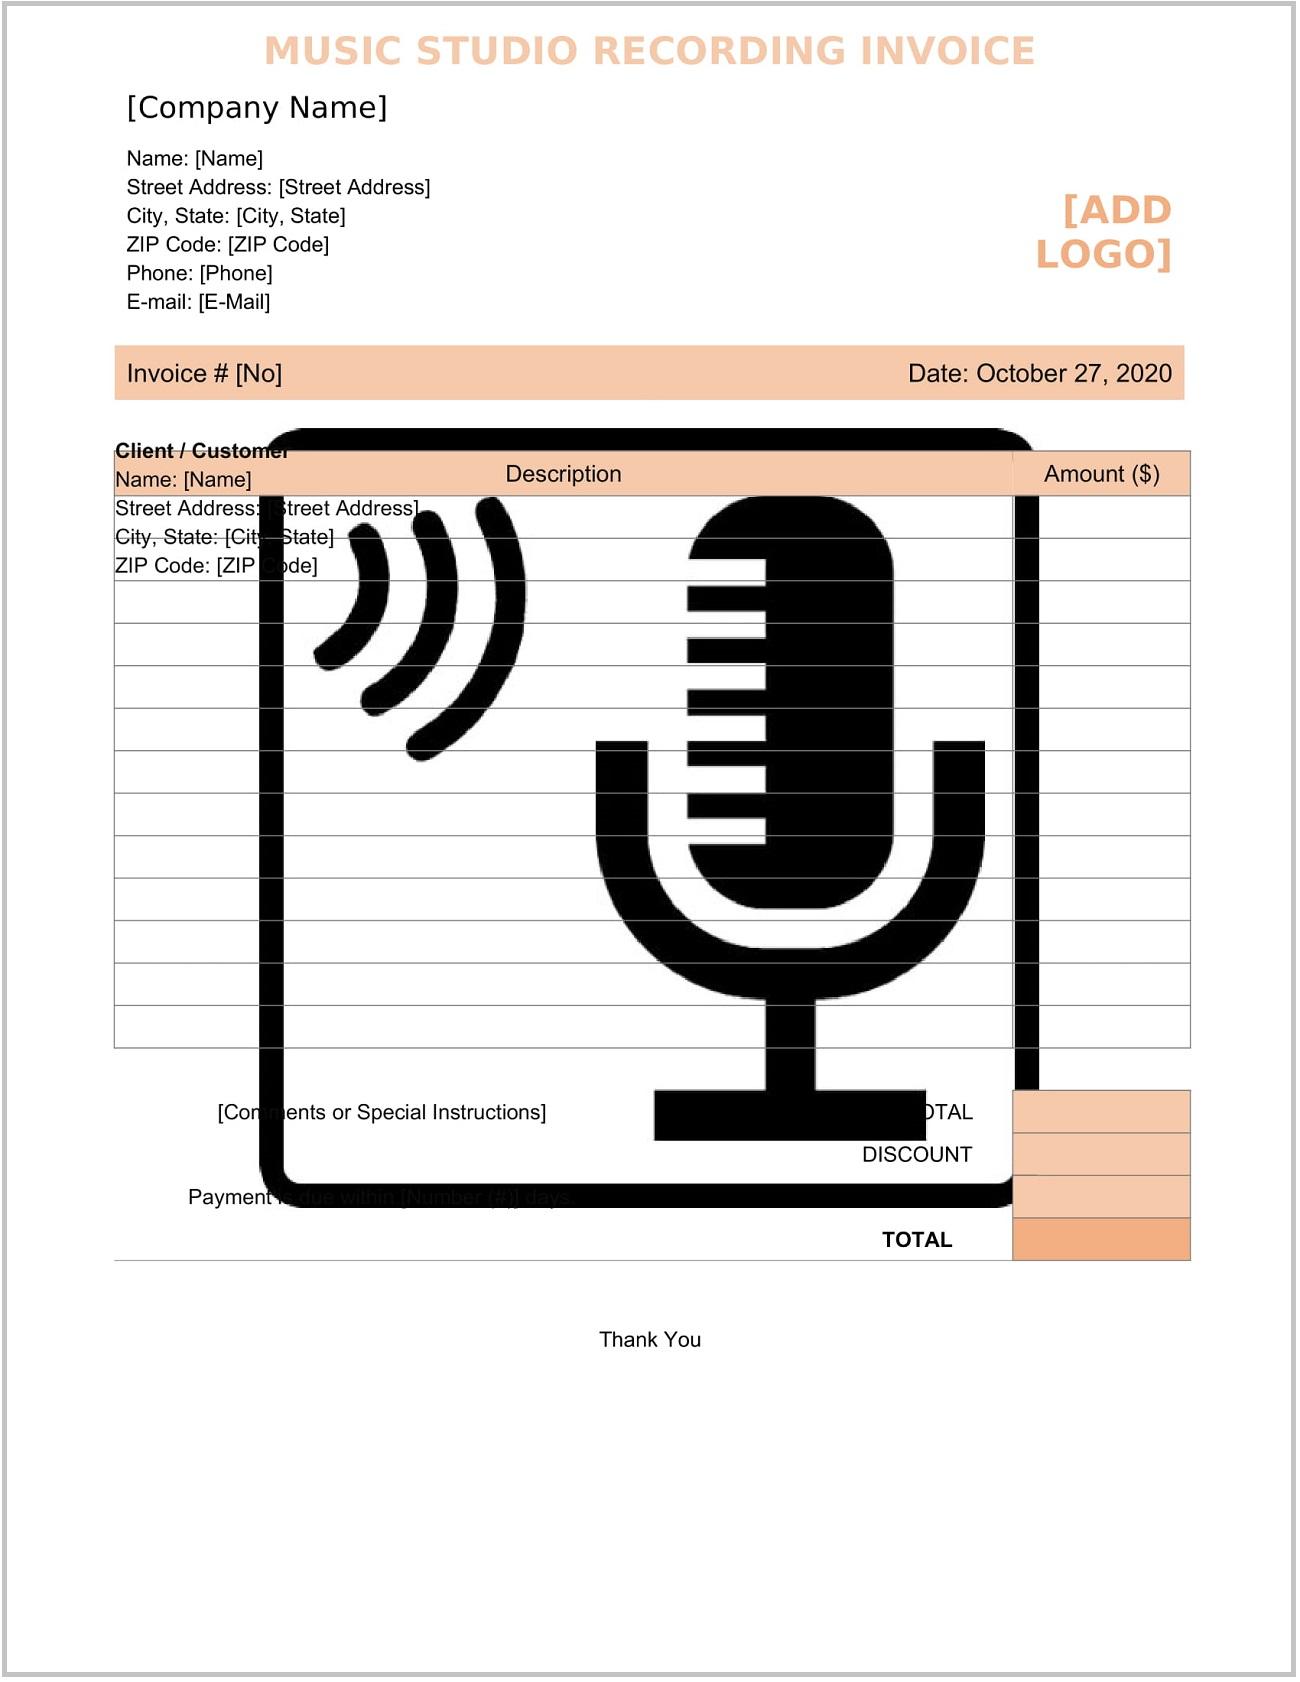 Music Studio Recording Invoice Word Form Template